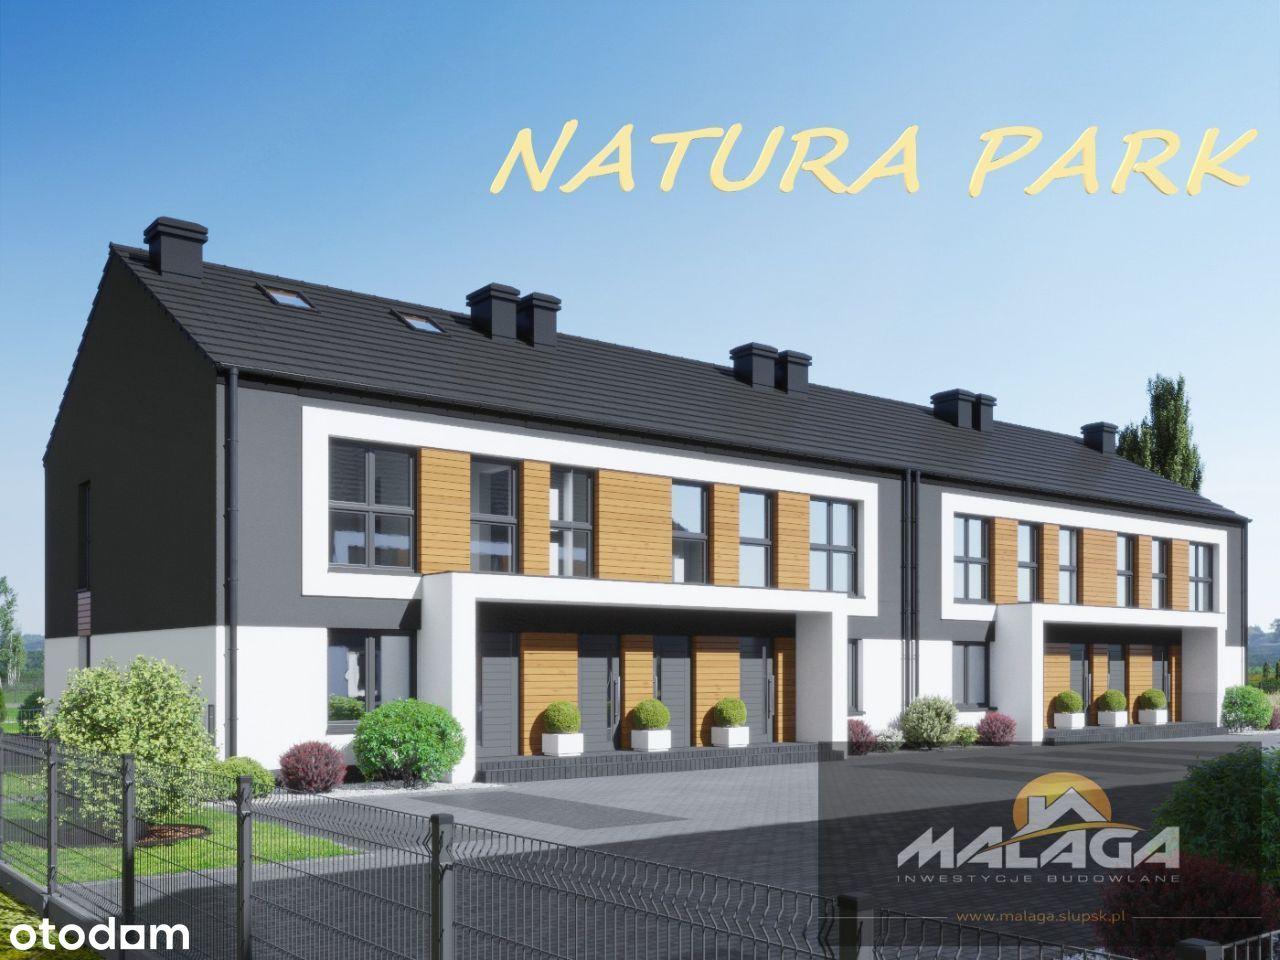 Natura Park - mieszkanie z ogrodem